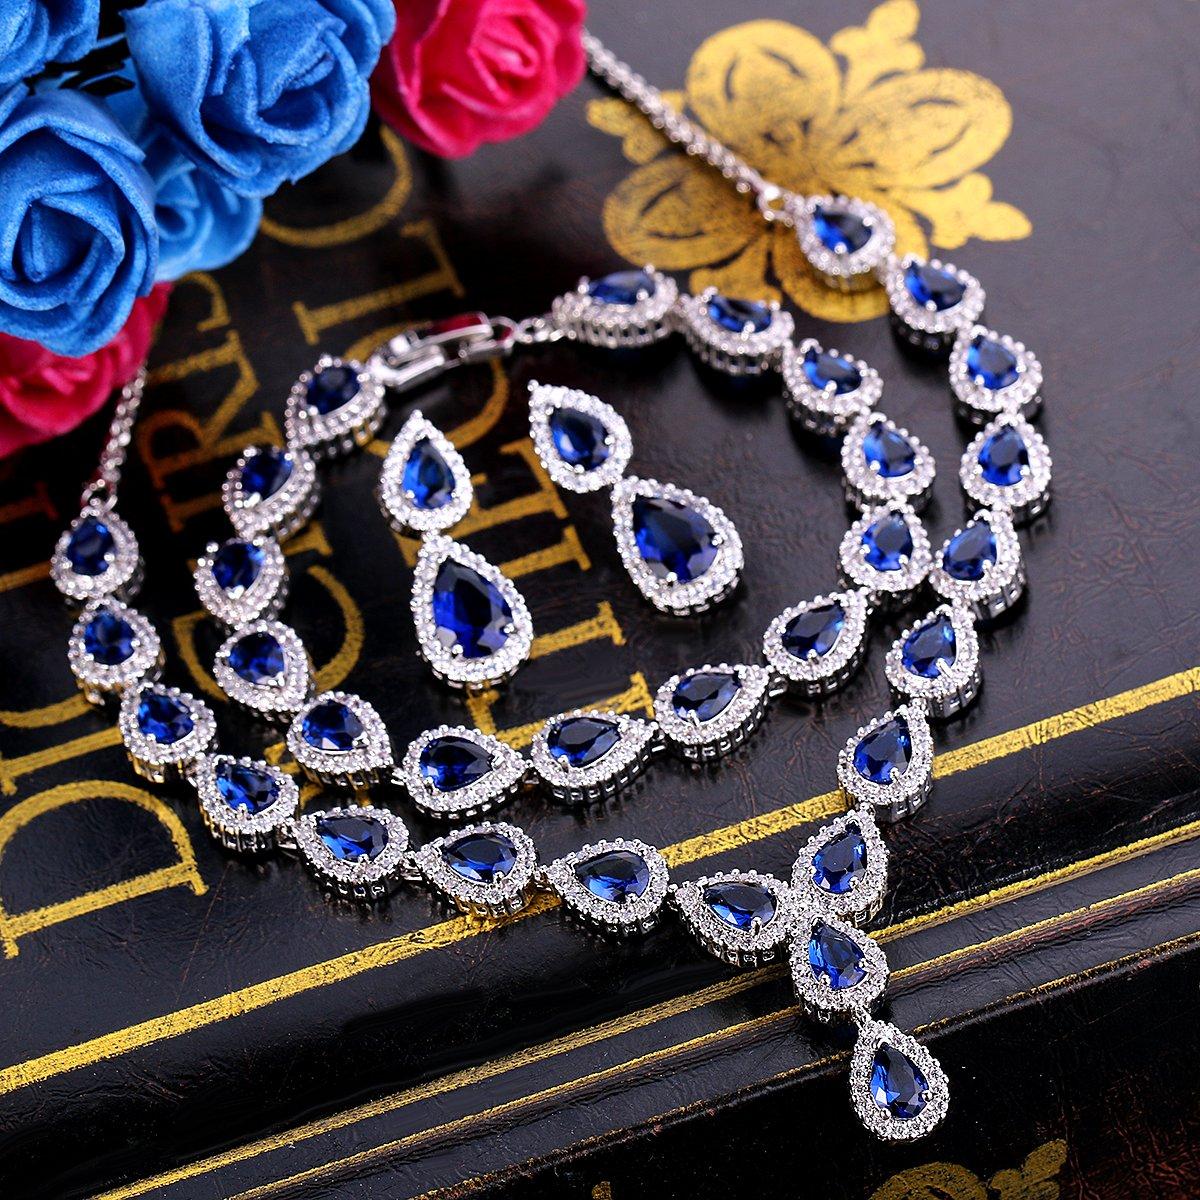 BriLove Women's Wedding Bridal Jewelry Set Y-Necklace Tennis Bracelet Dangle Earrings Set with Teardrop CZ Infinity Figure 8 Sapphire Color Silver-Tone September Birthstone by BriLove (Image #4)